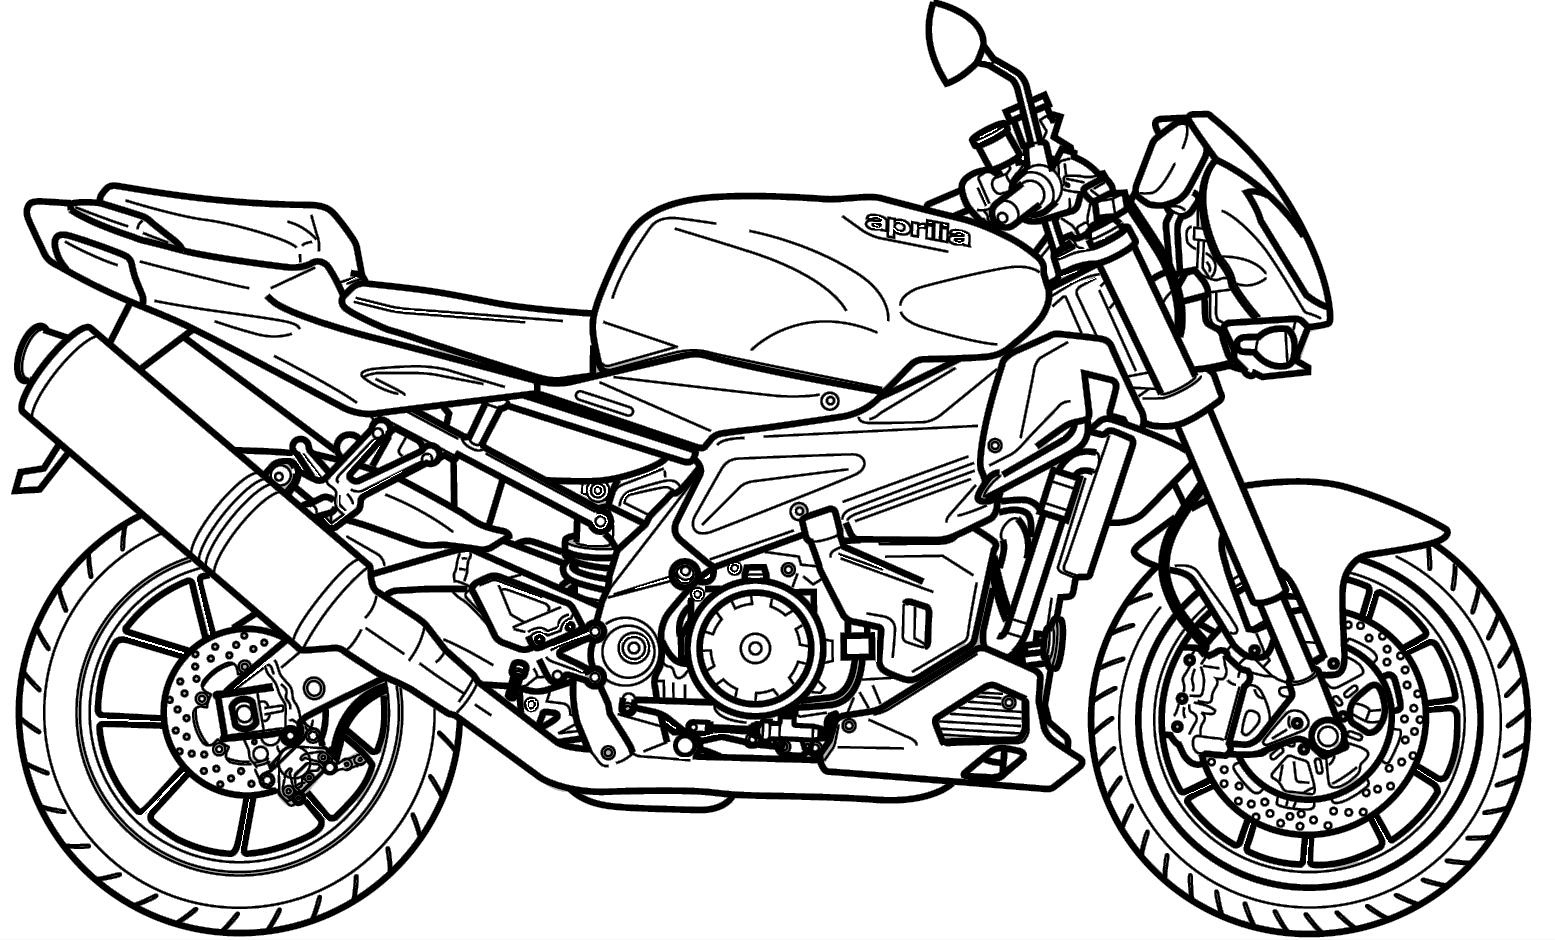 Imagens De Motos Para Colorir